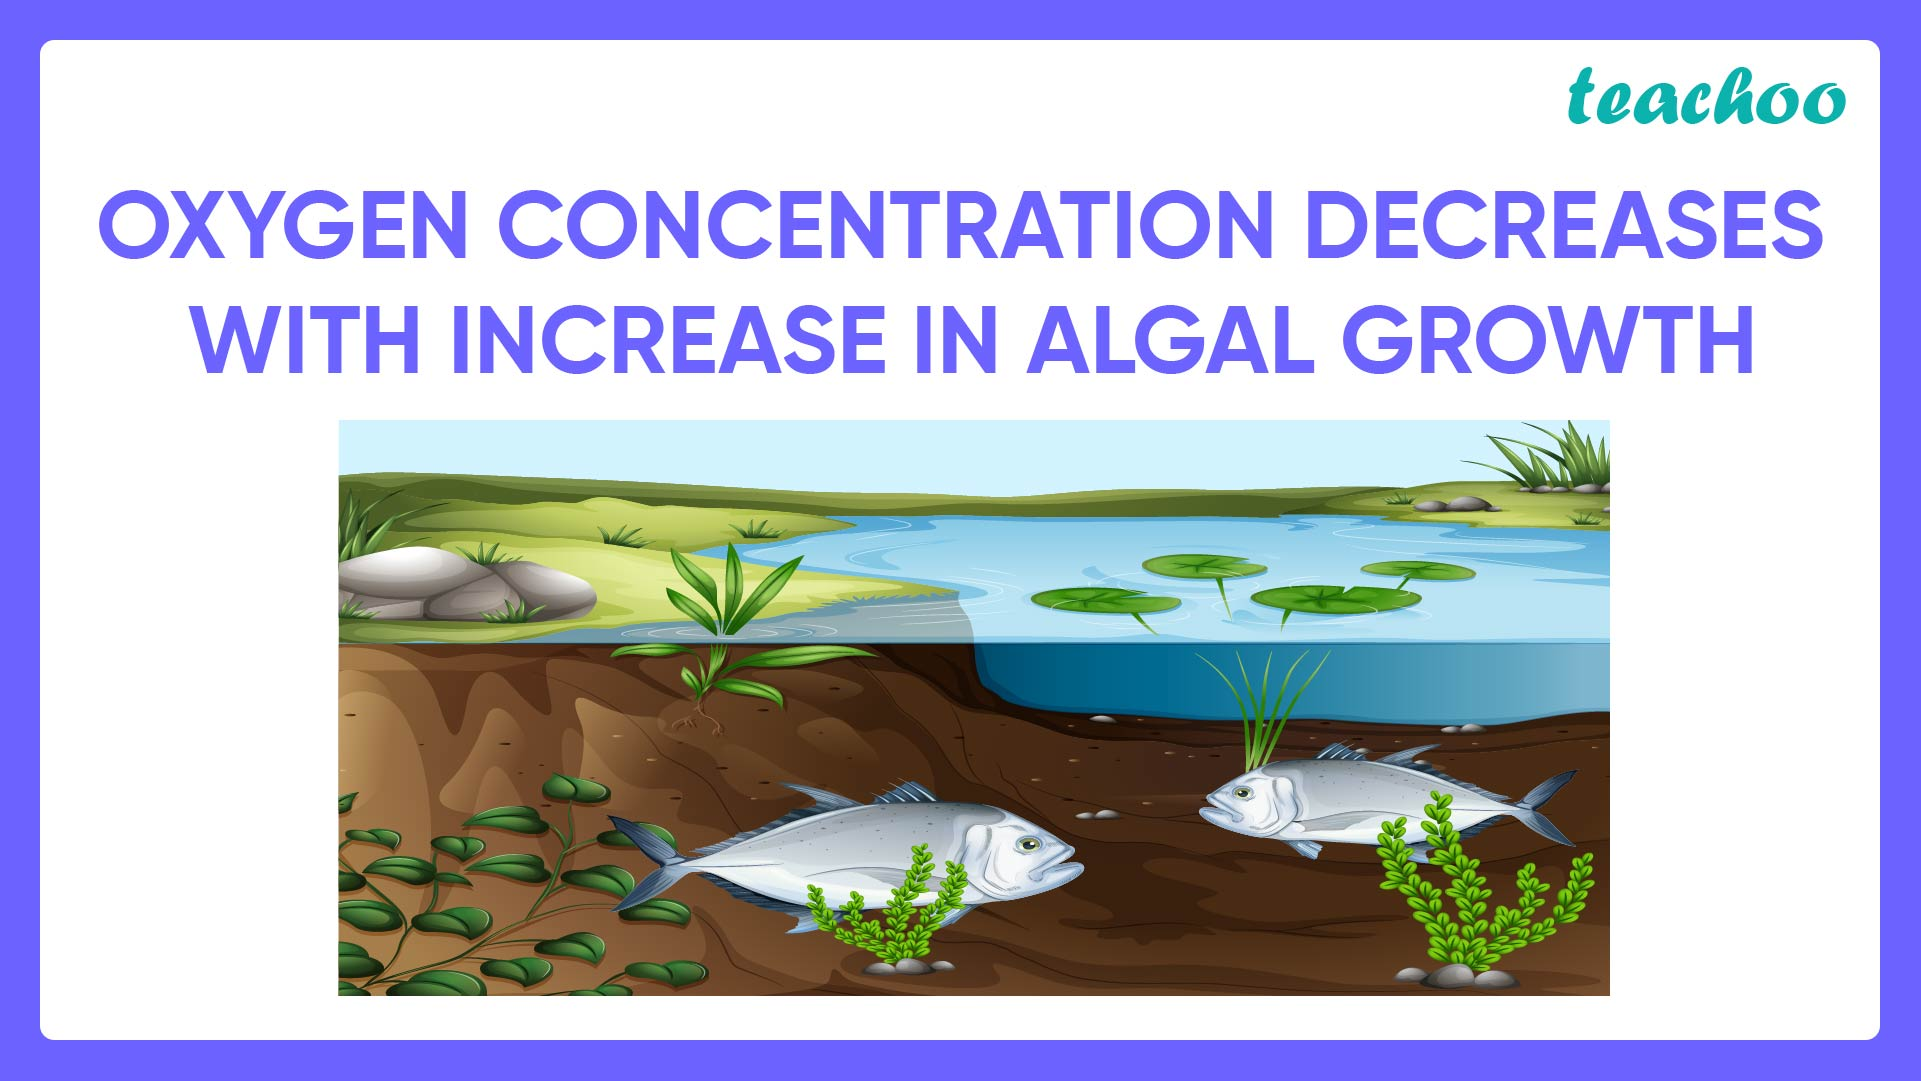 Oxygen Concentration Decrease with increase in Algal Growth-Teachoo-01.jpg